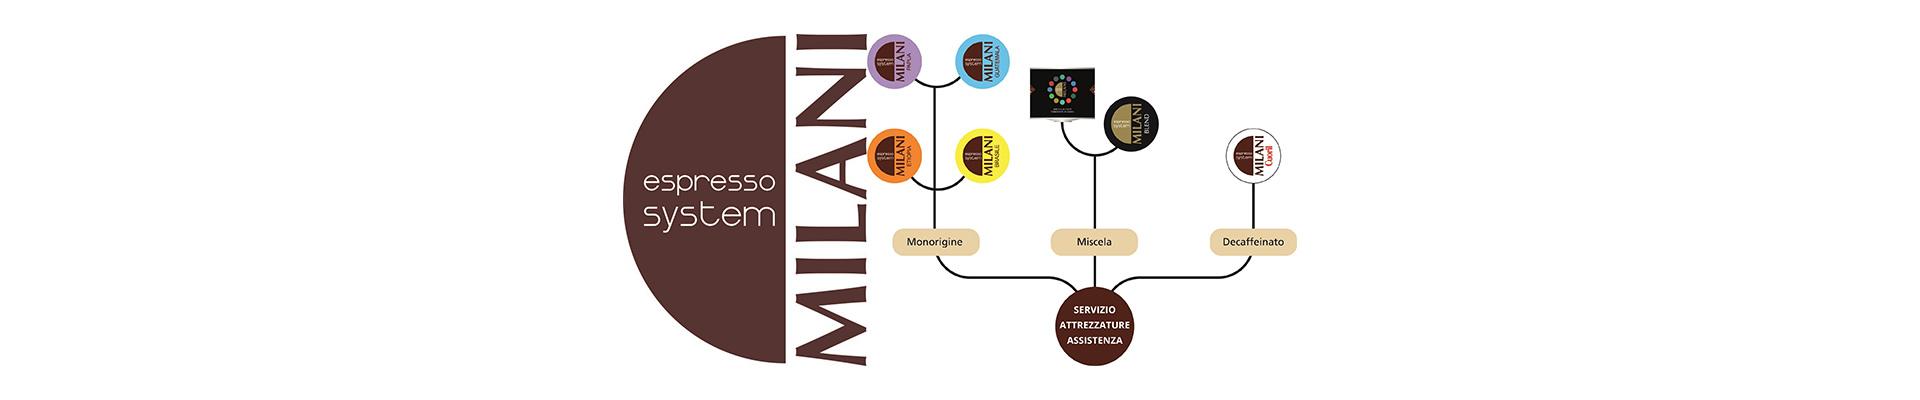 Espresso System Milani